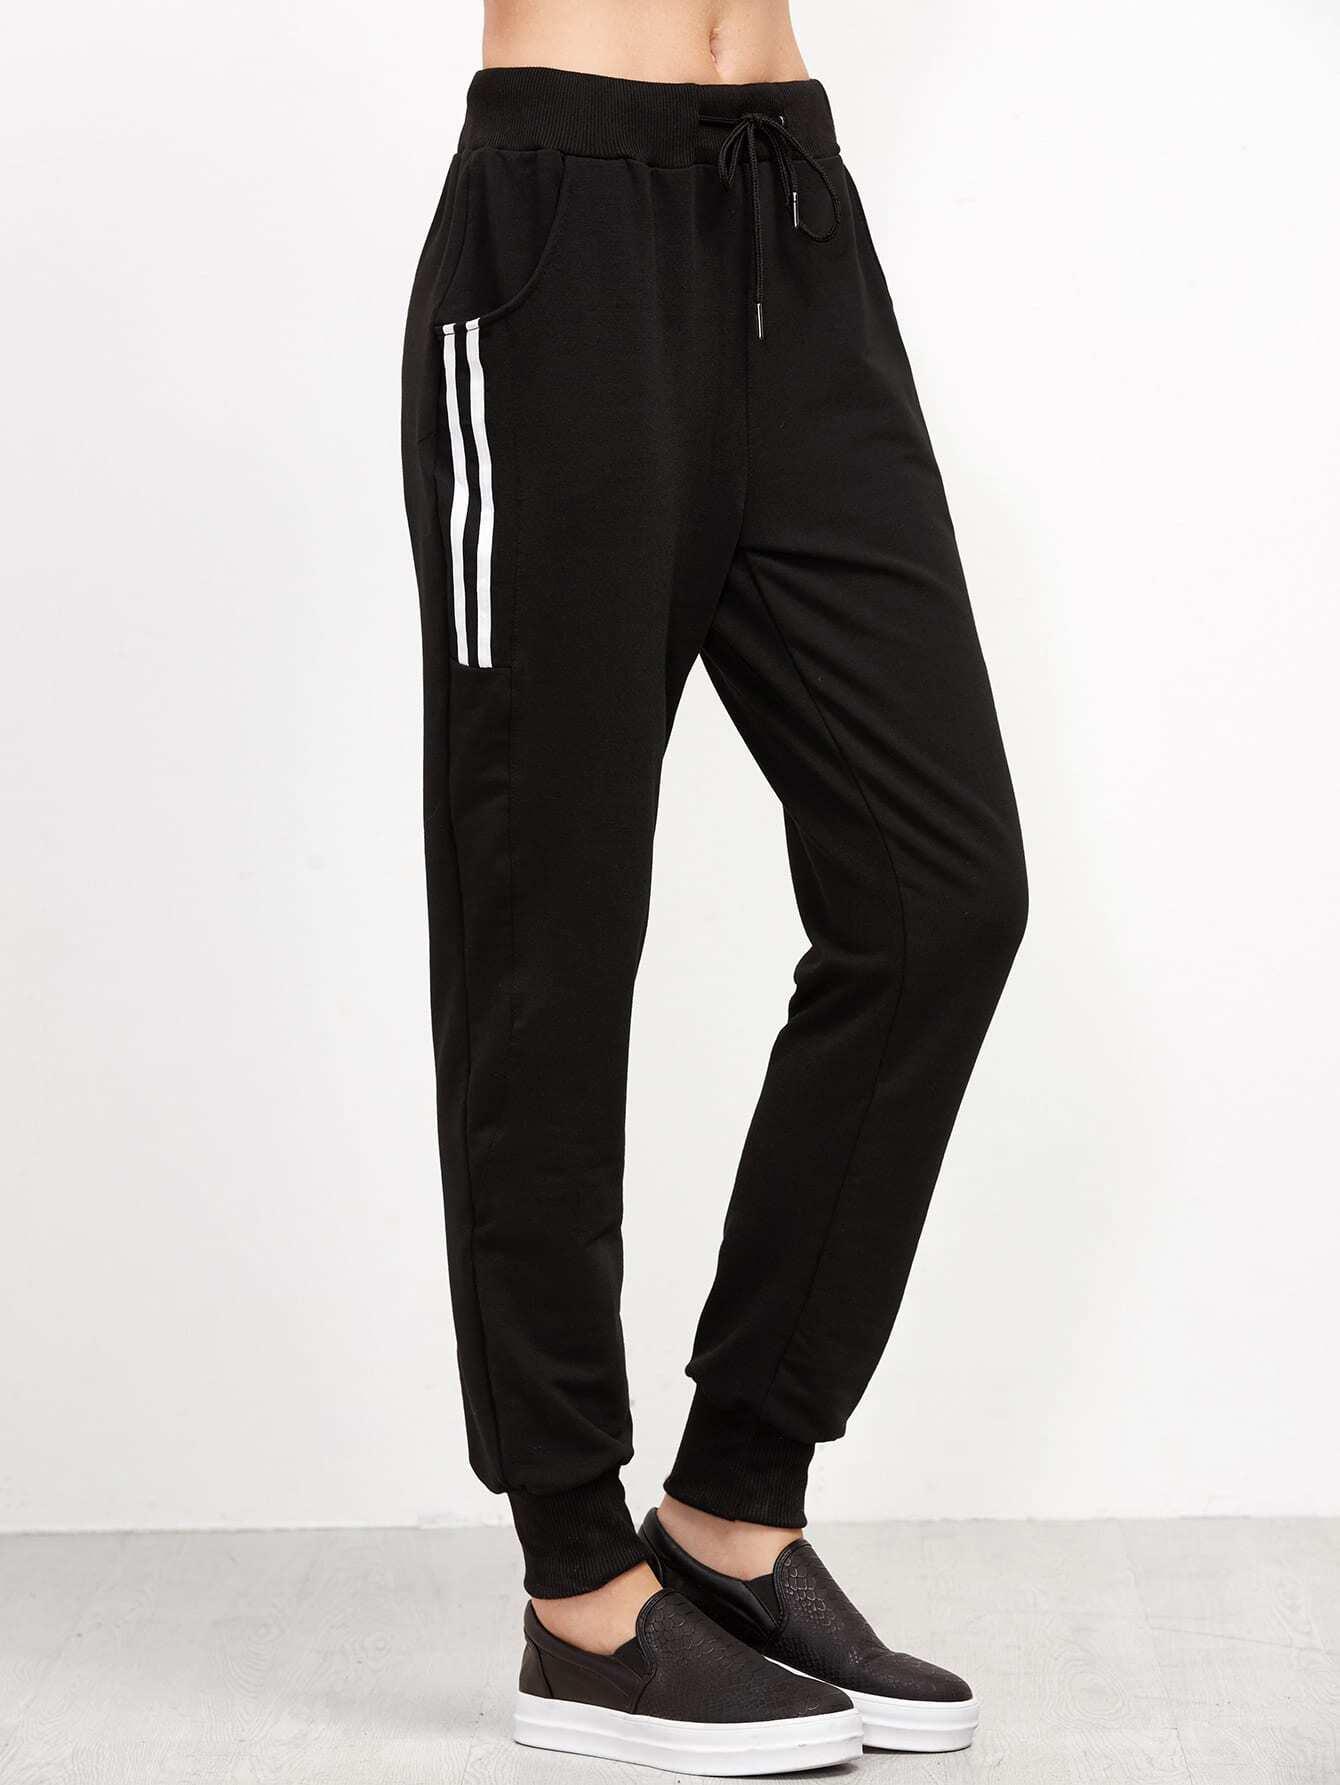 Striped Side Drawstring Pants -SheIn(Sheinside)